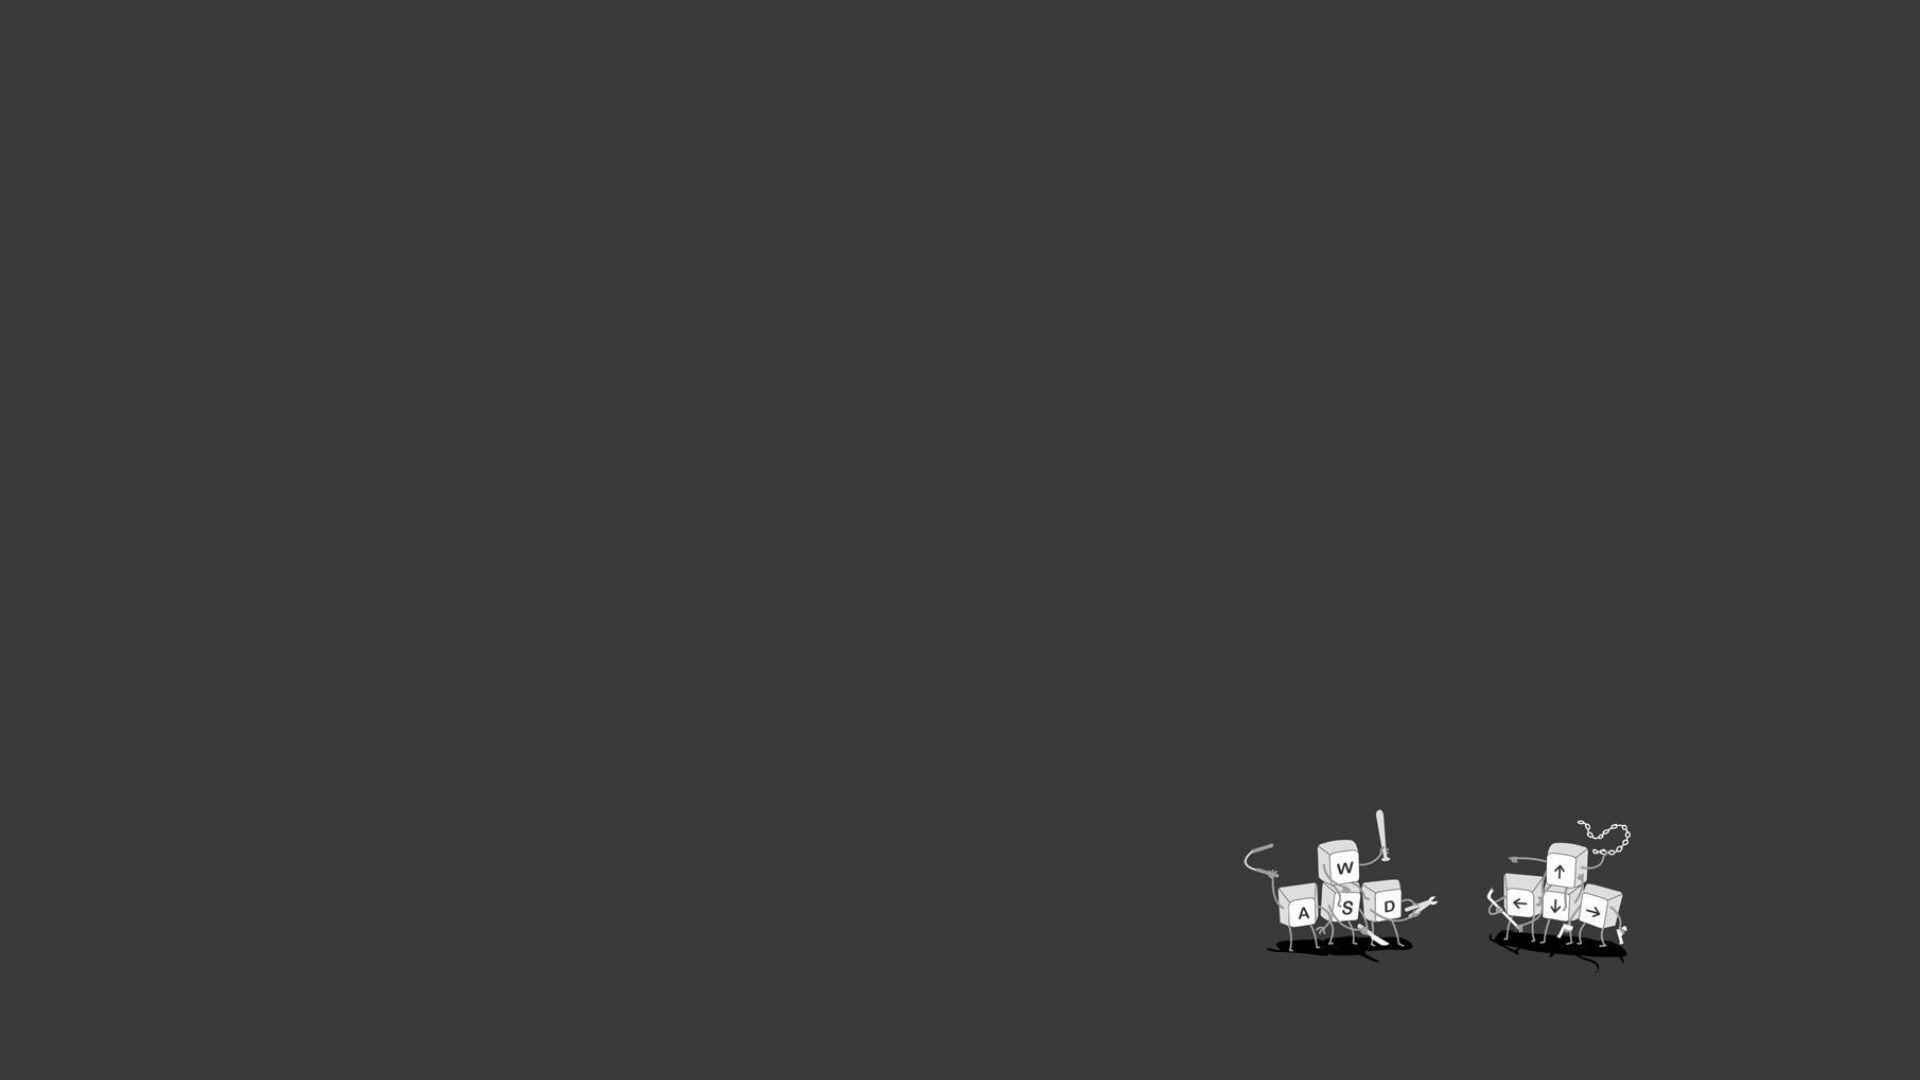 Funny Simple Desktop Wallpapers   Top Funny Simple Desktop 1920x1080